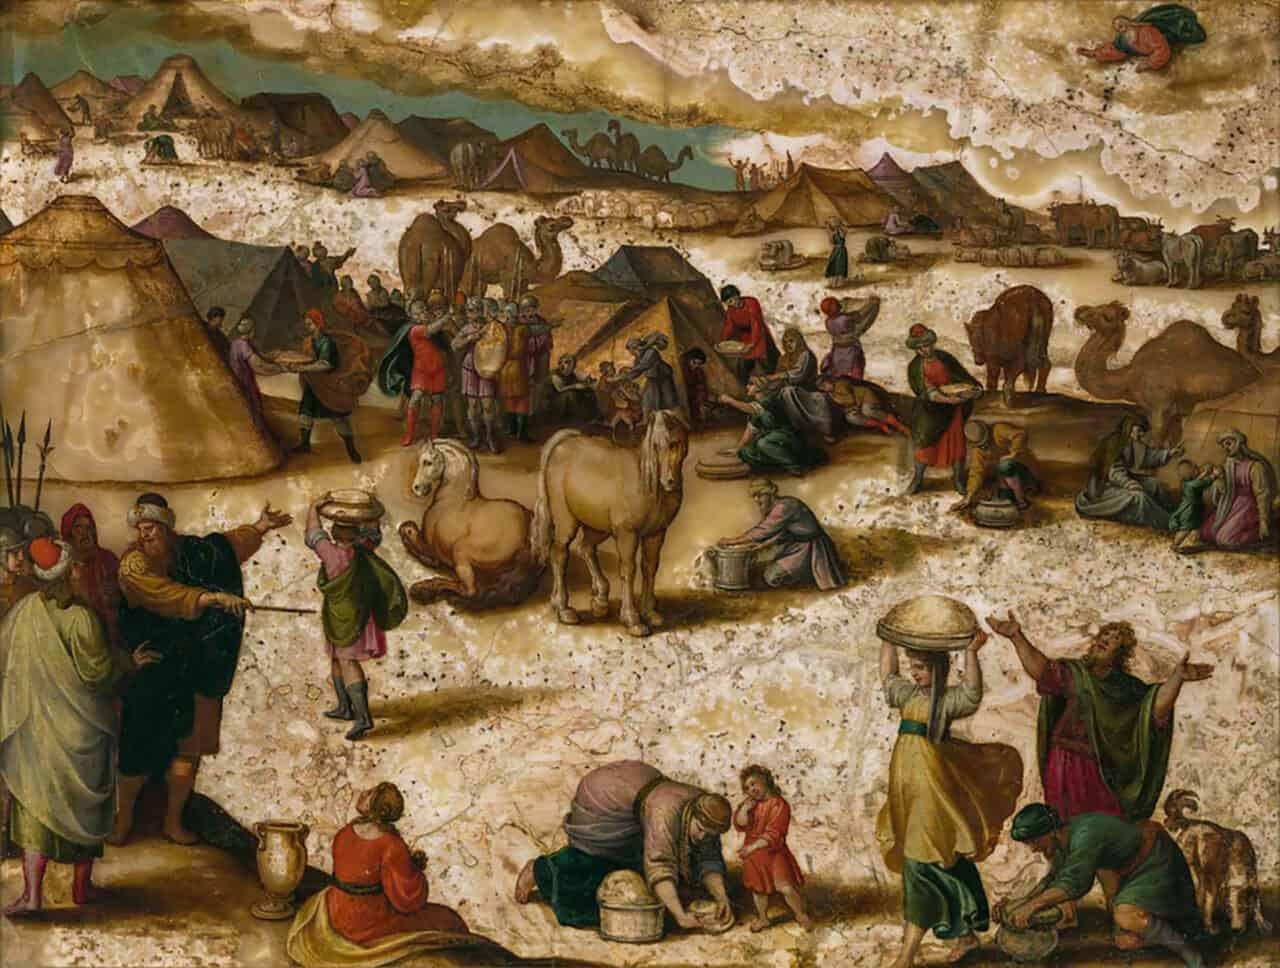 Gathering of the Manna, Antonio Tempesta, 1555-1630